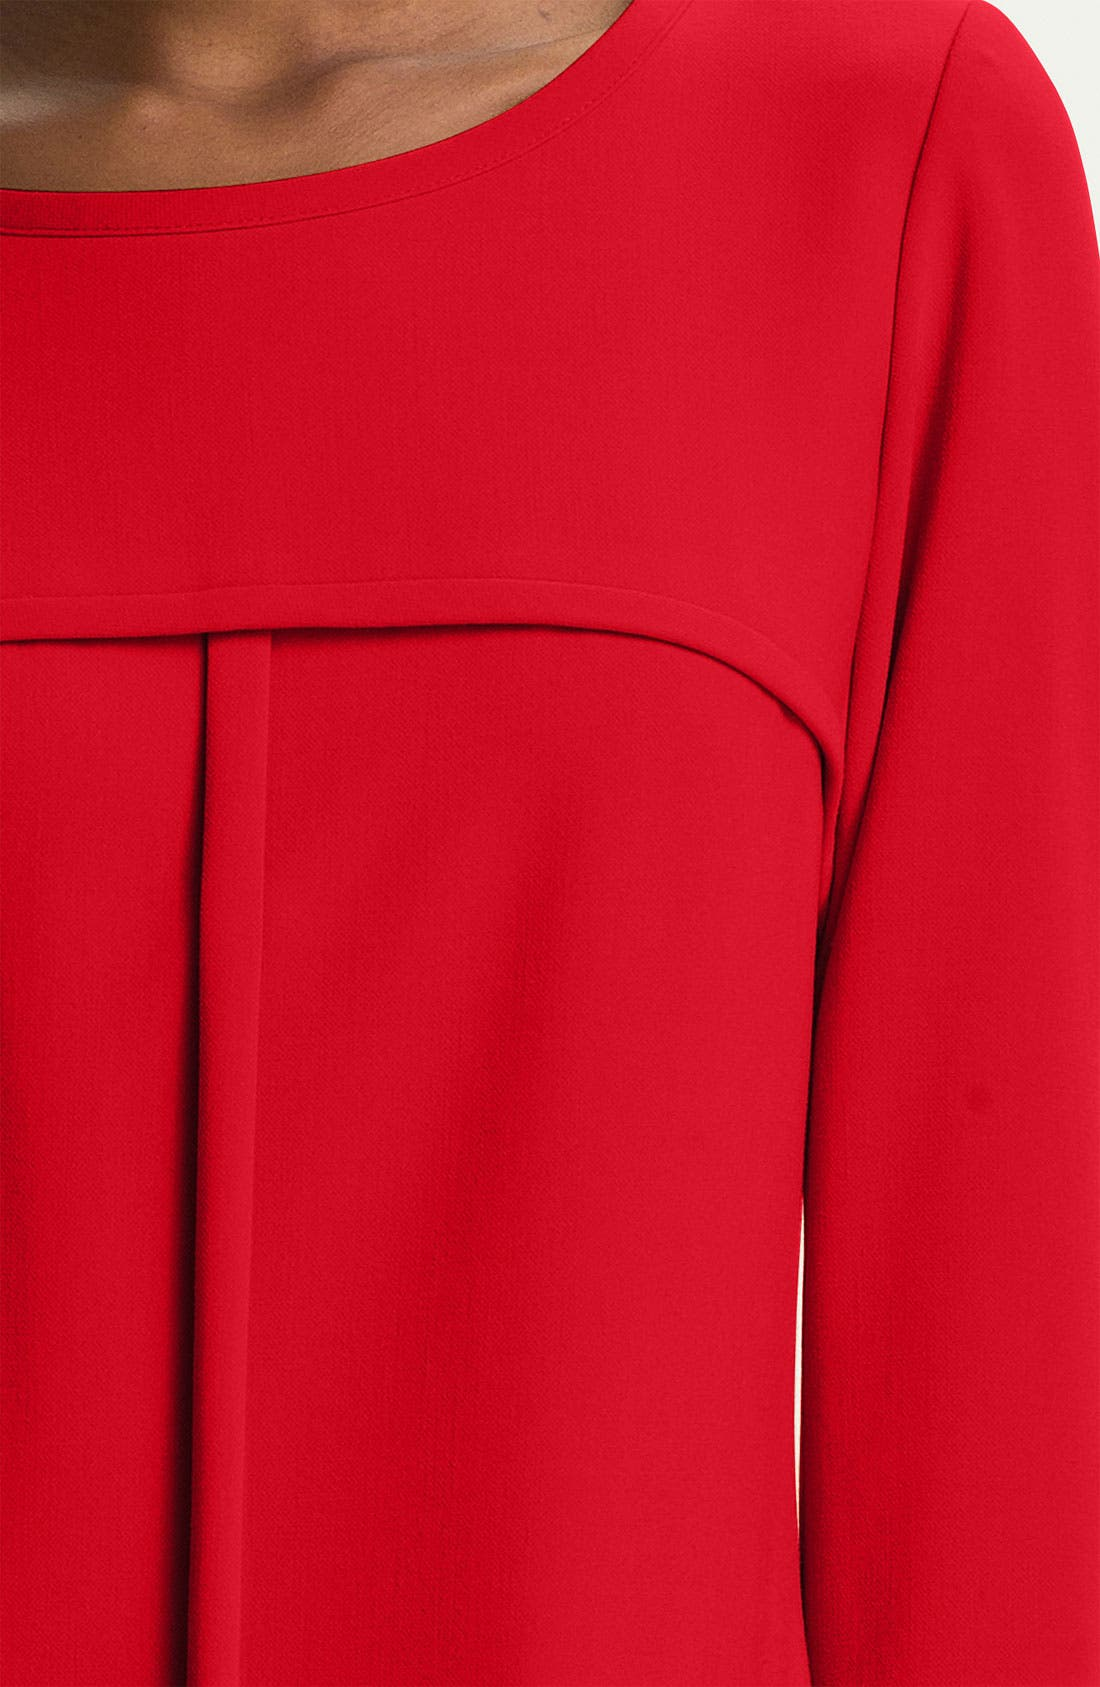 Alternate Image 3  - Tahari Ponte Shift Dress (Petite)